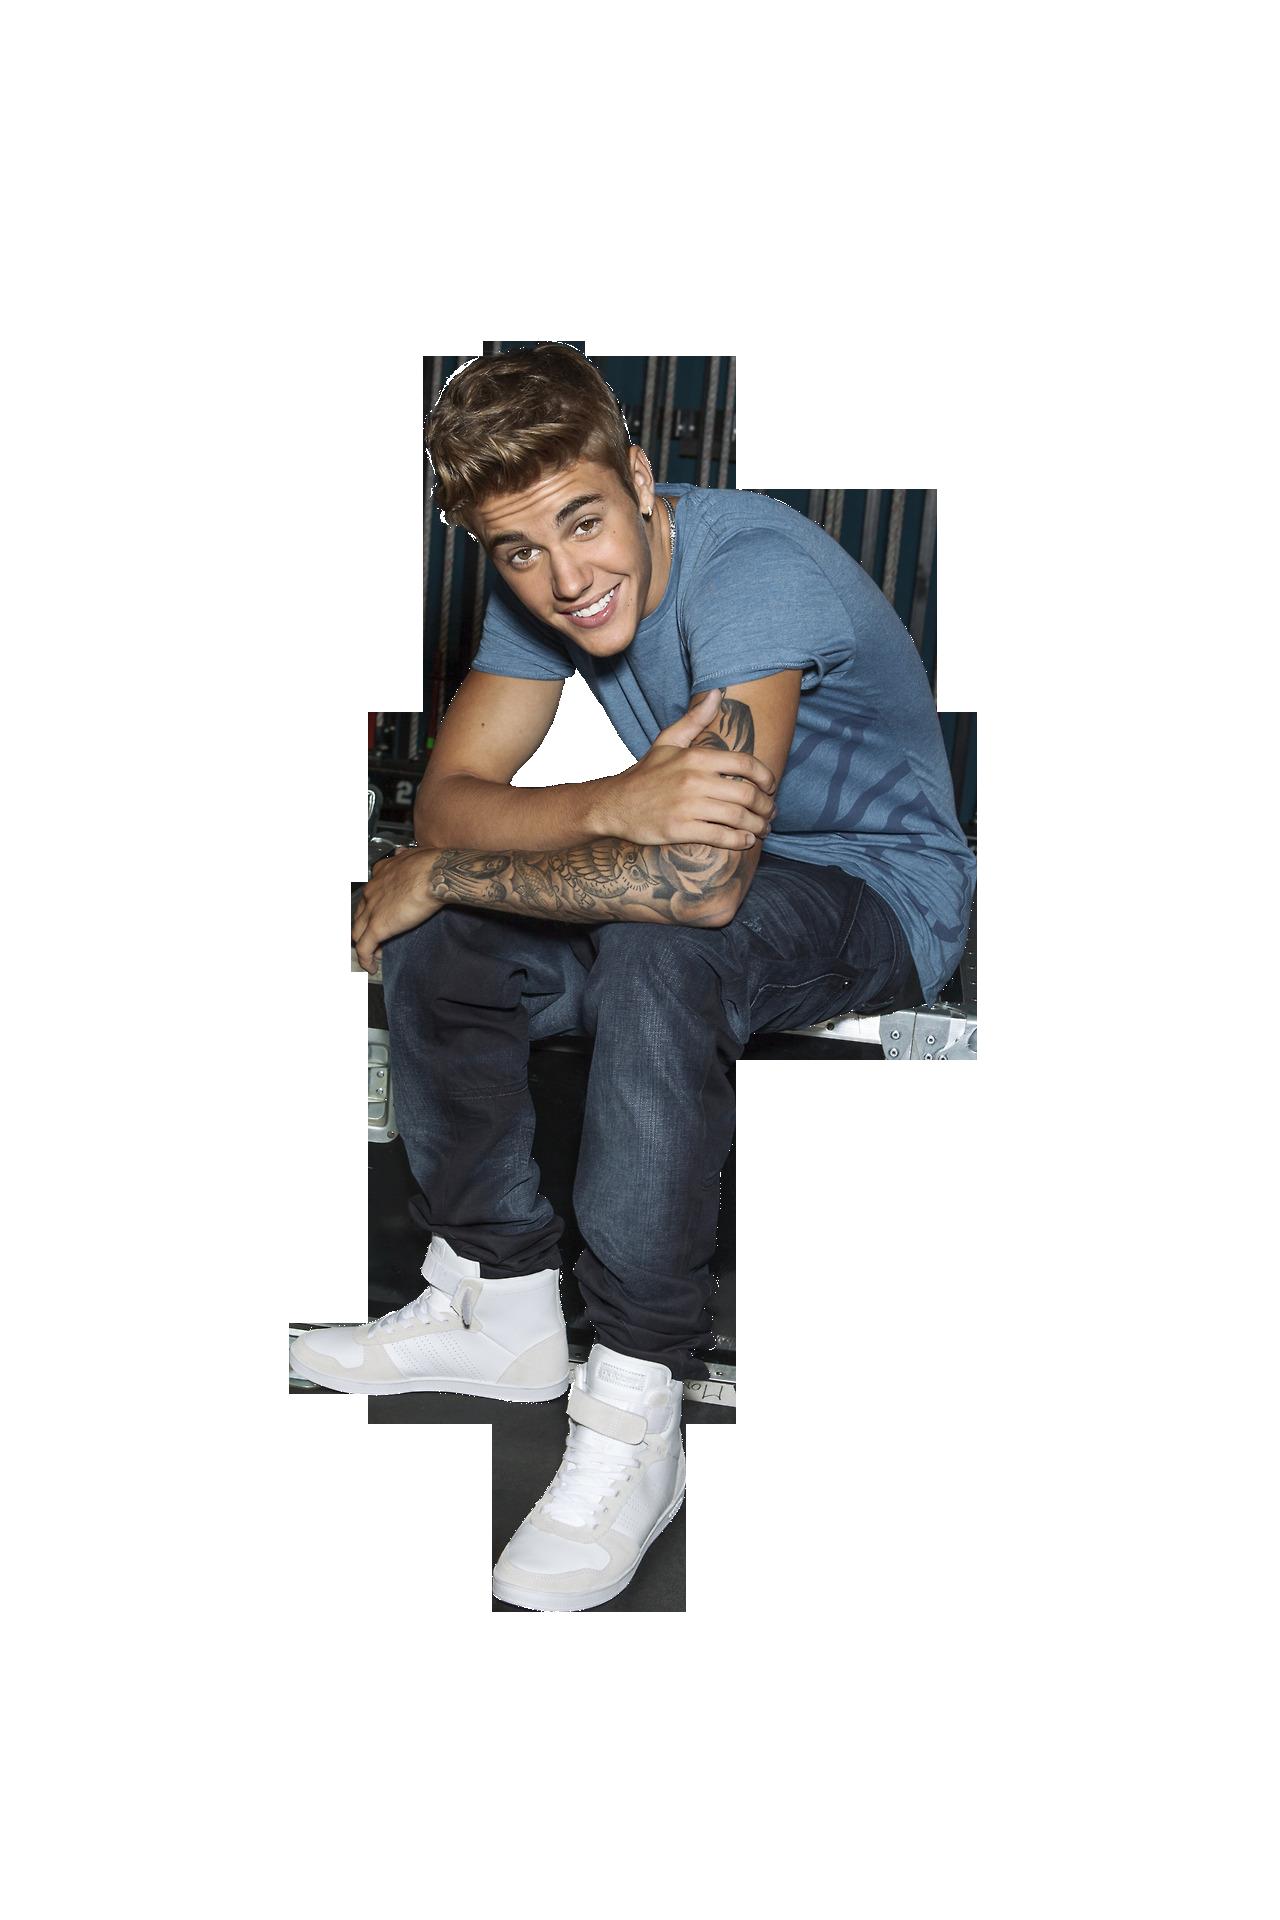 Justin Bieber Sitting Png Image Justin Bieber Person Sitting Justin